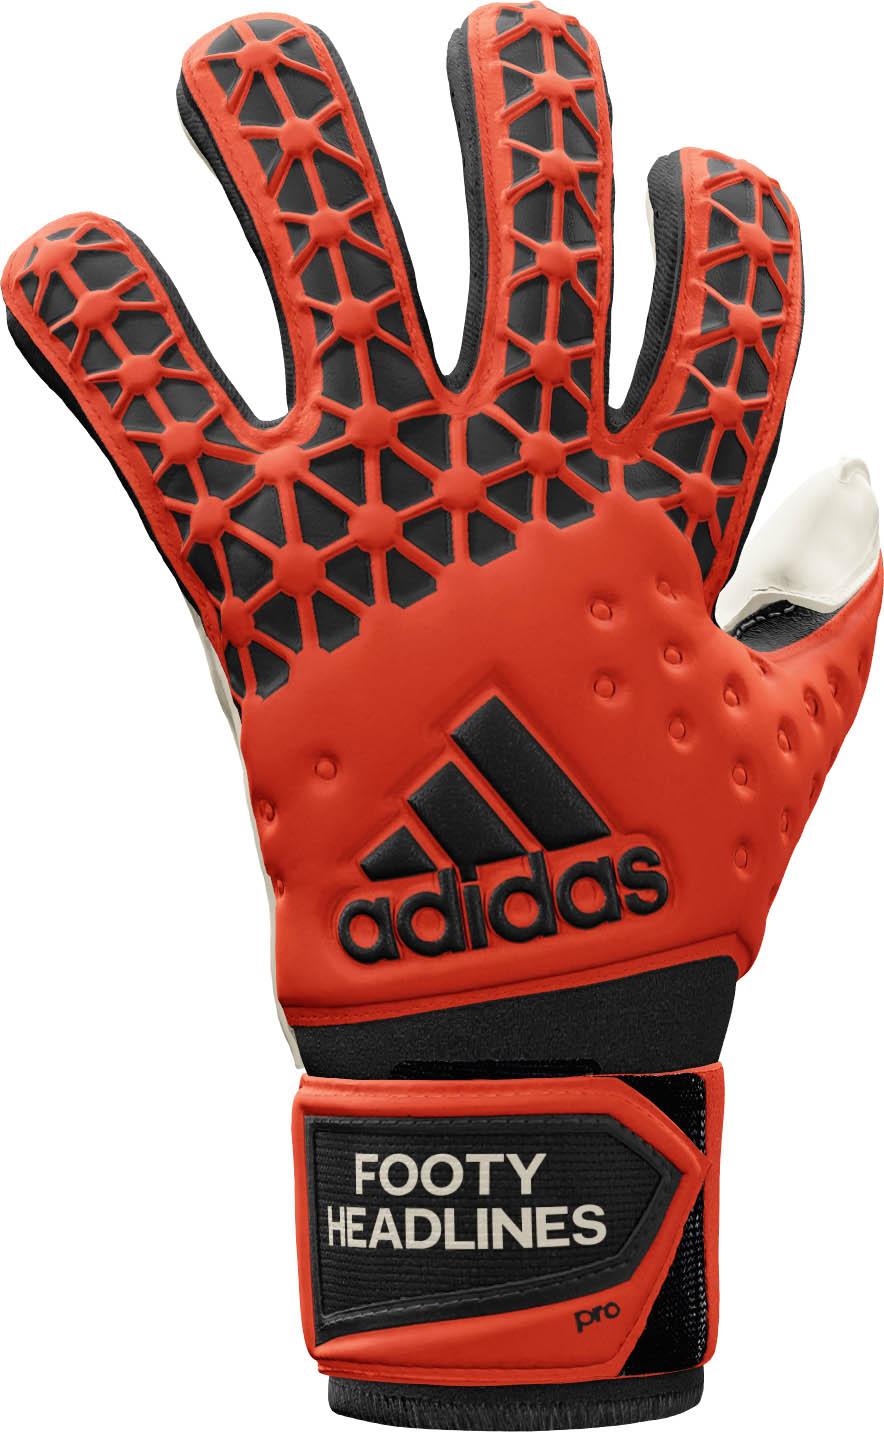 Red Adidas Ace 2015-2016 Goalkeeper Gloves Released ... |Goalkeeper Gloves Adidas 2015